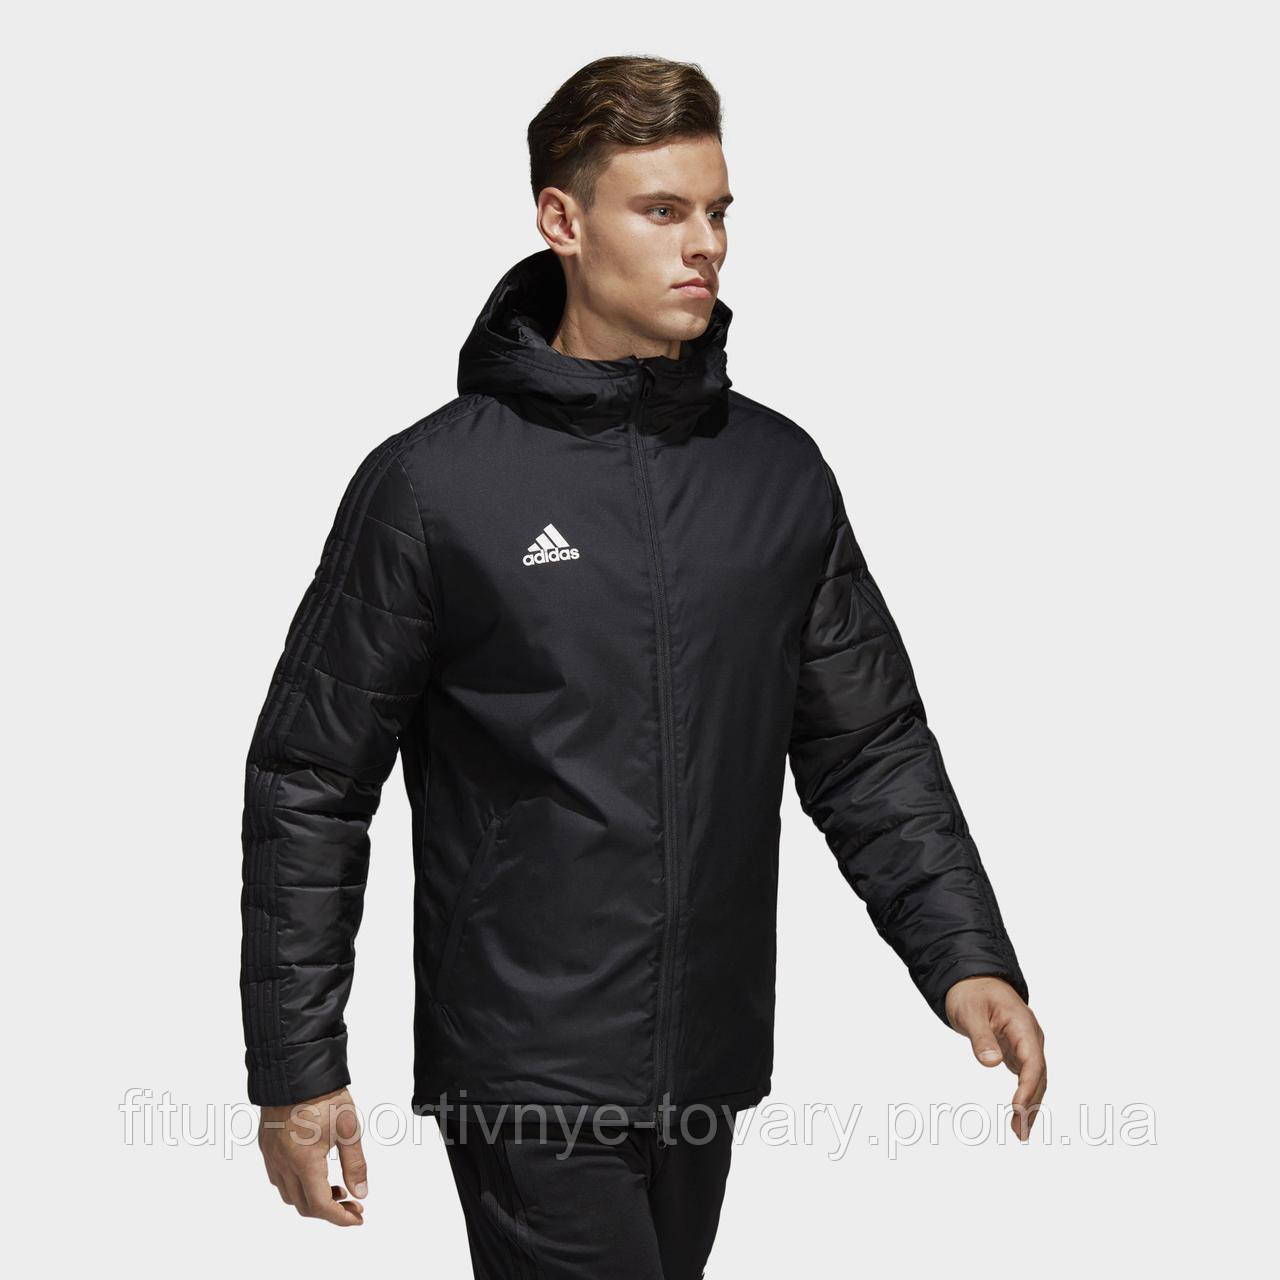 Мужская зимняя куртка Adidas JKT18 WINT JKT BQ6602